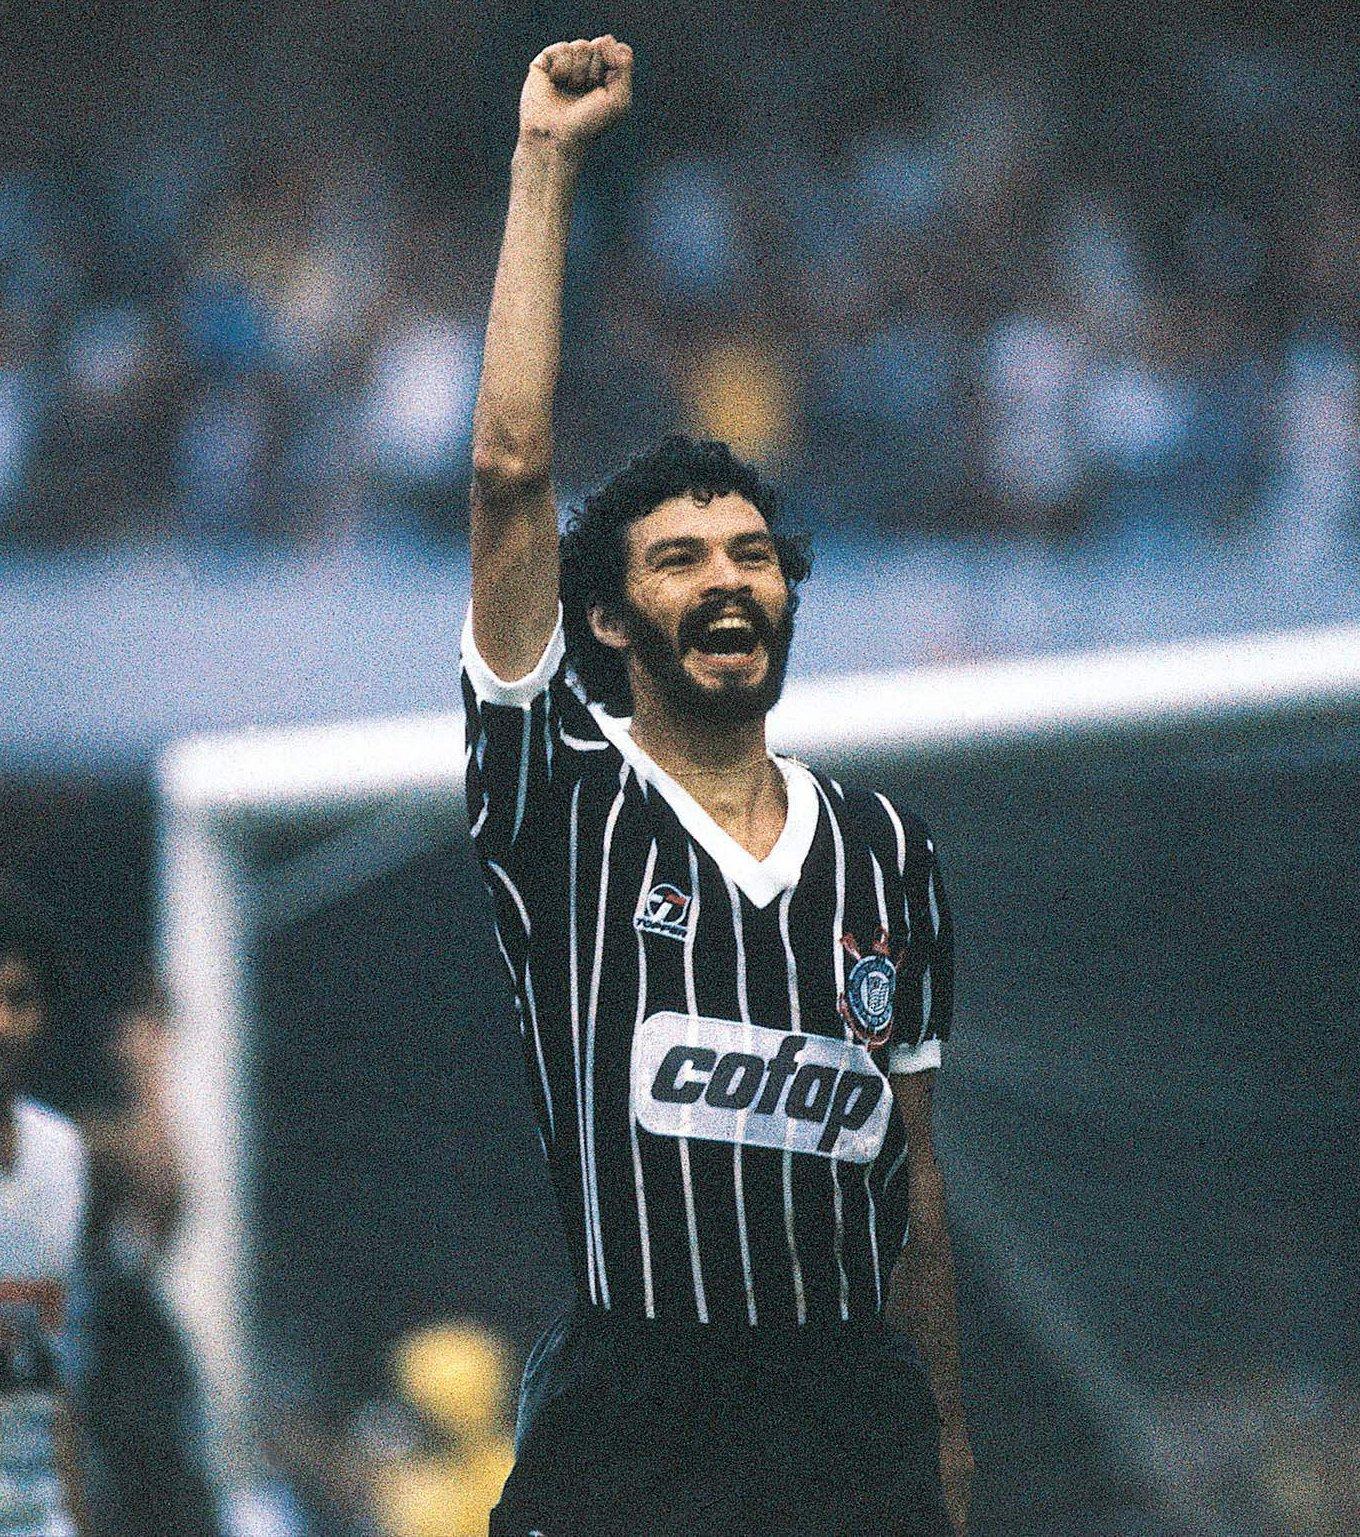 socrates 1983